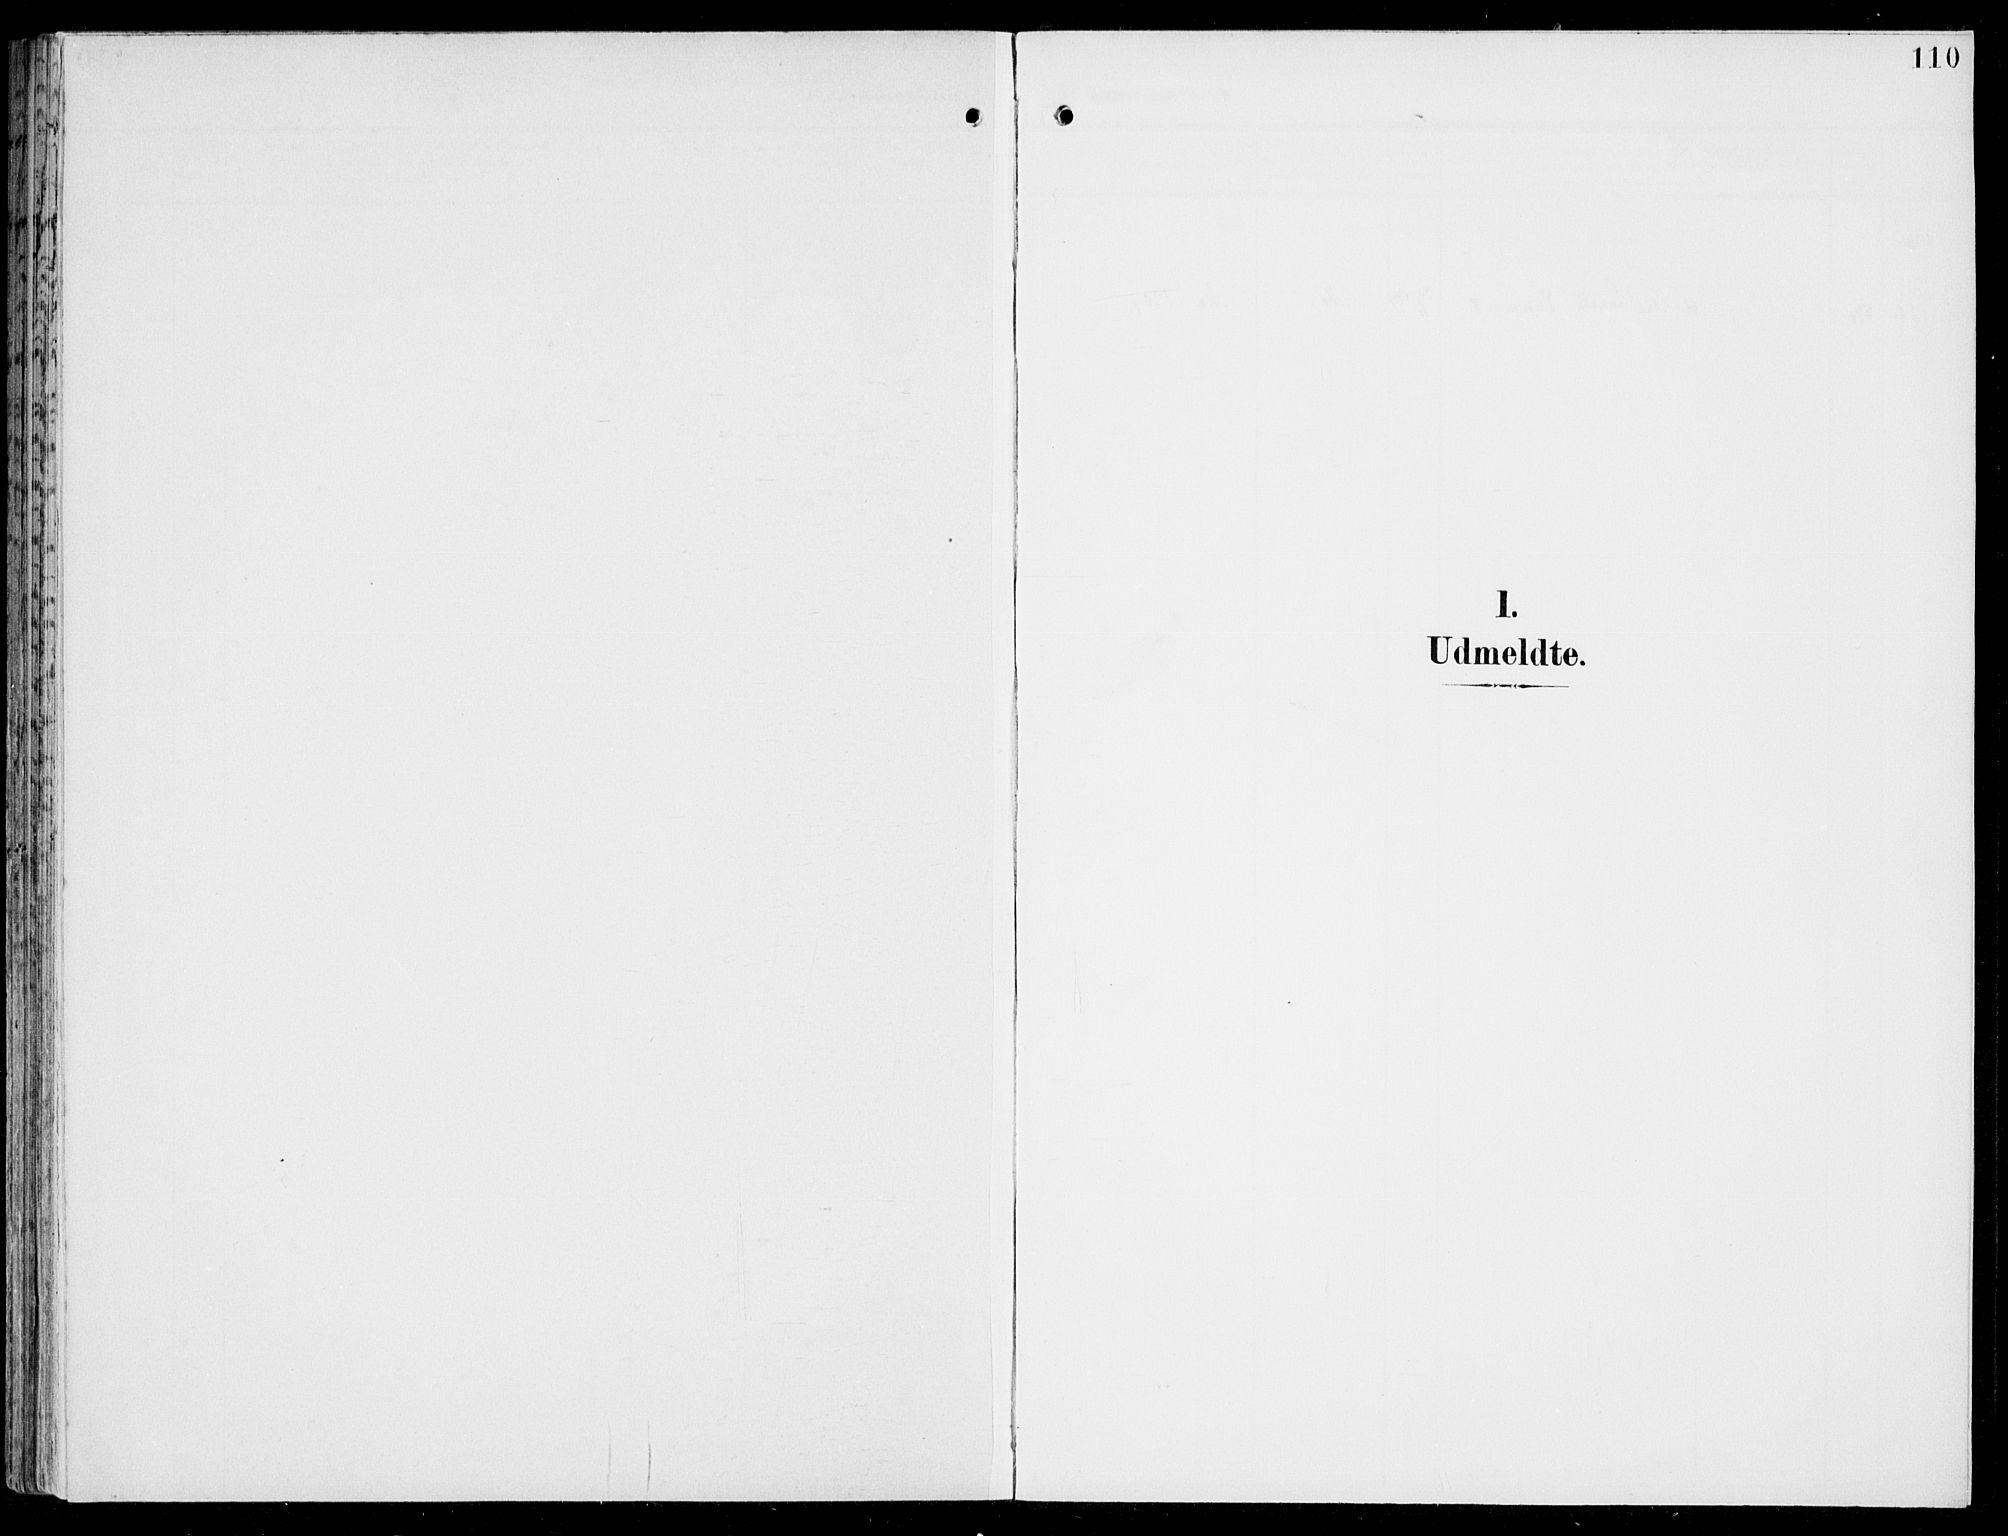 SAB, Hosanger Sokneprestembete, H/Haa: Parish register (official) no. C  2, 1901-1925, p. 110